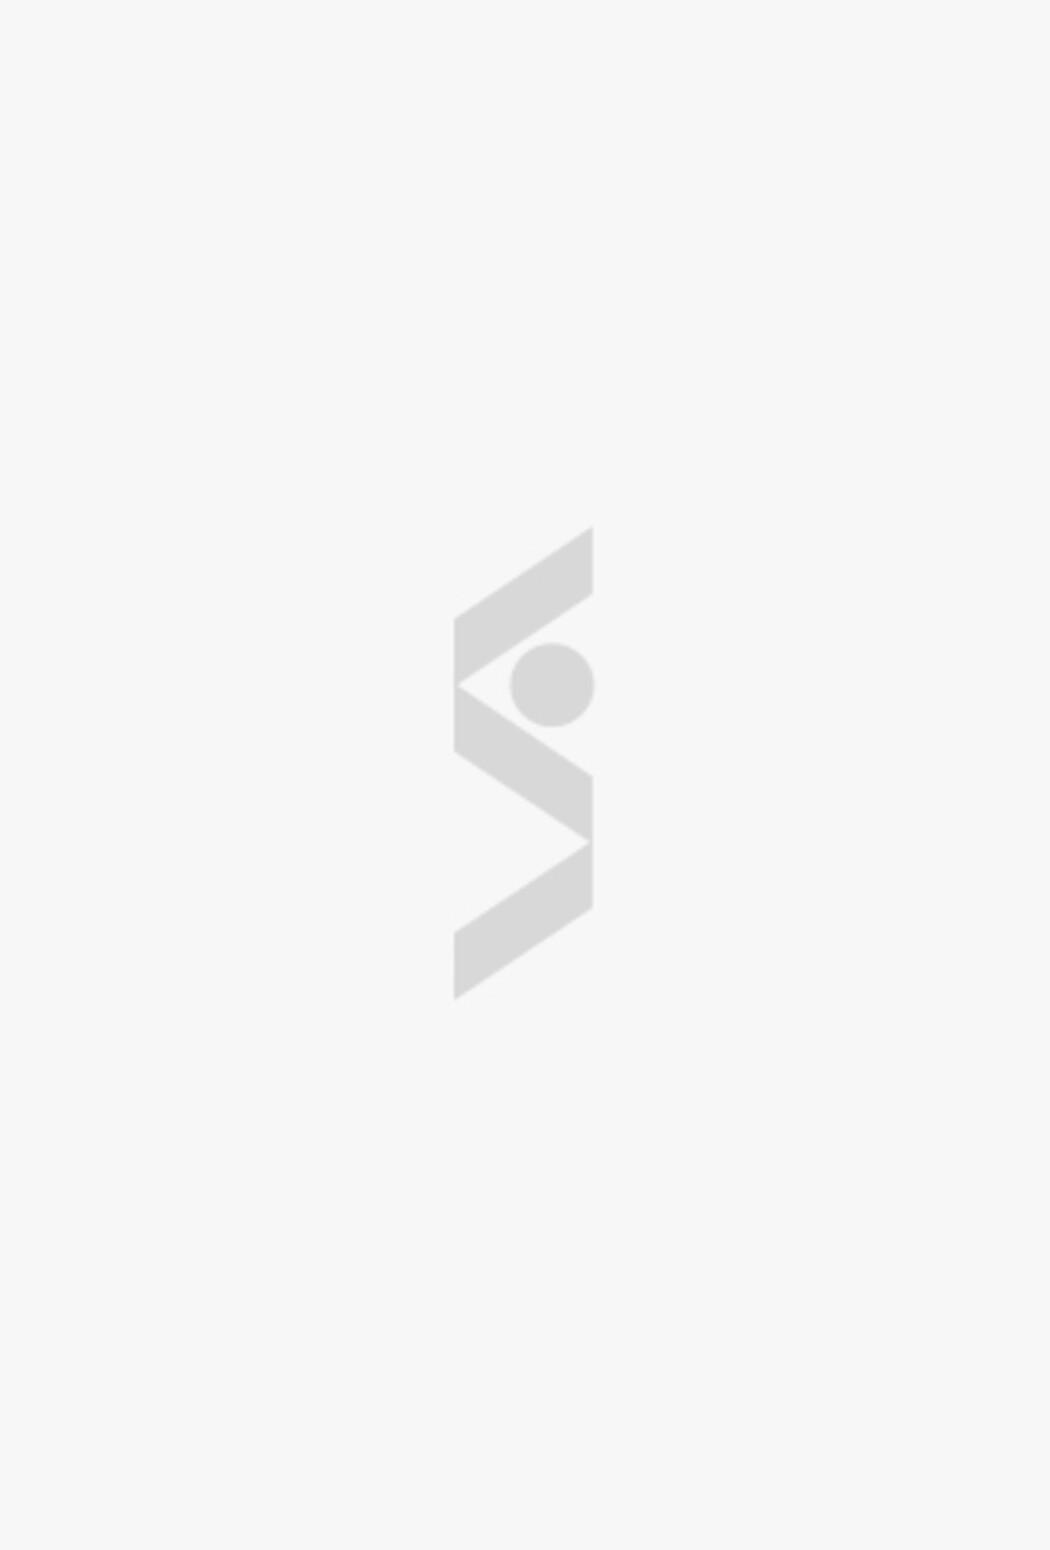 Пиала priscilla 16 см COINCASA